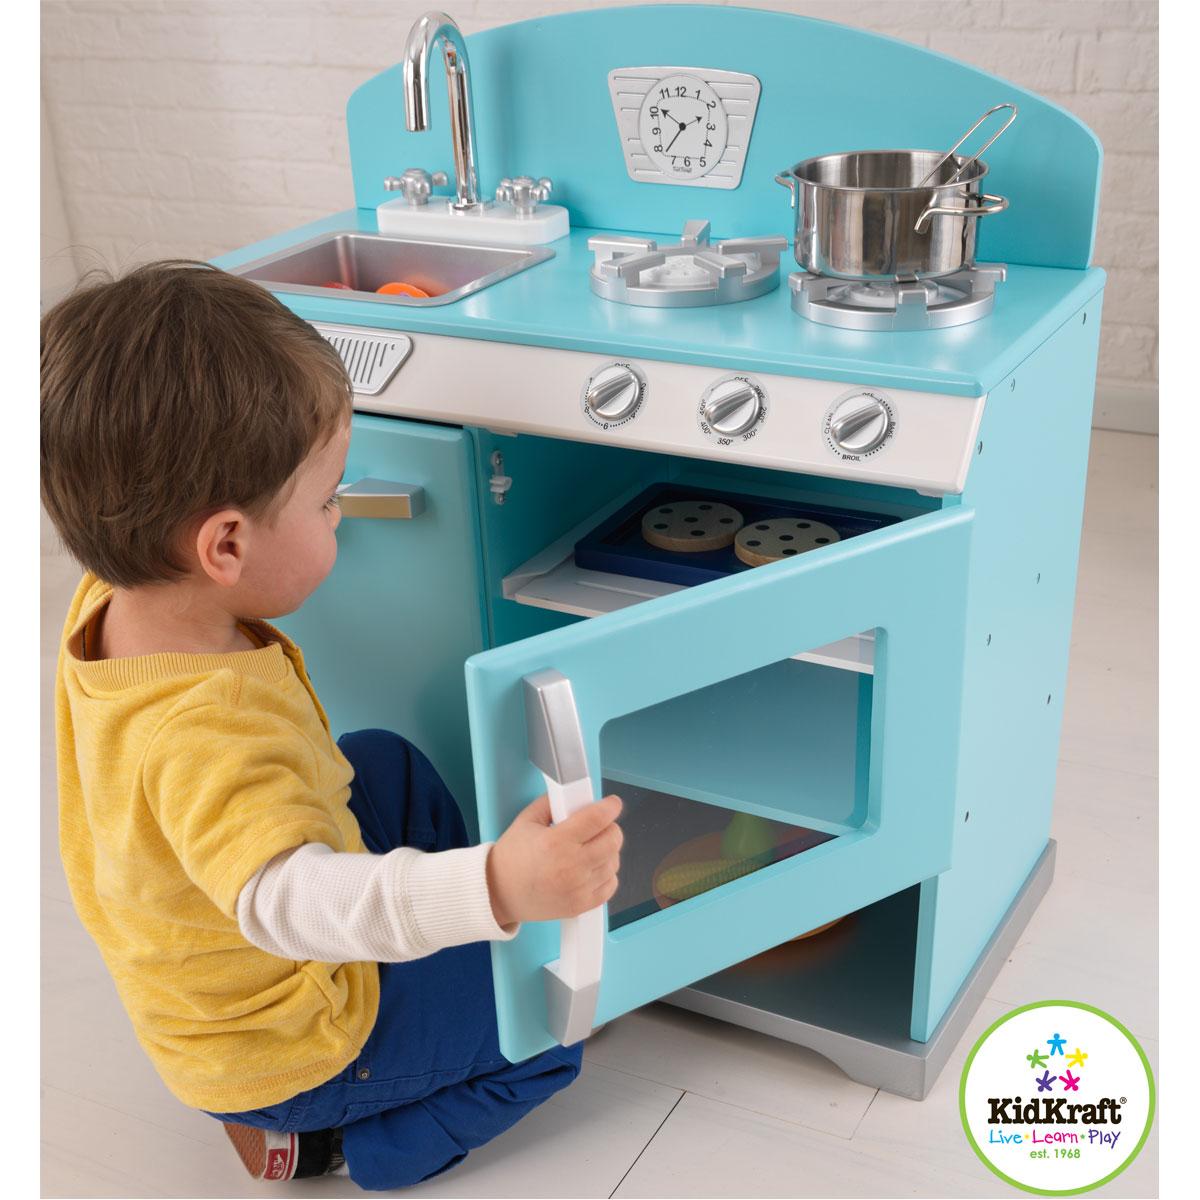 kidkraft kinderk che kochherd aus omas zeiten blau aus holz. Black Bedroom Furniture Sets. Home Design Ideas